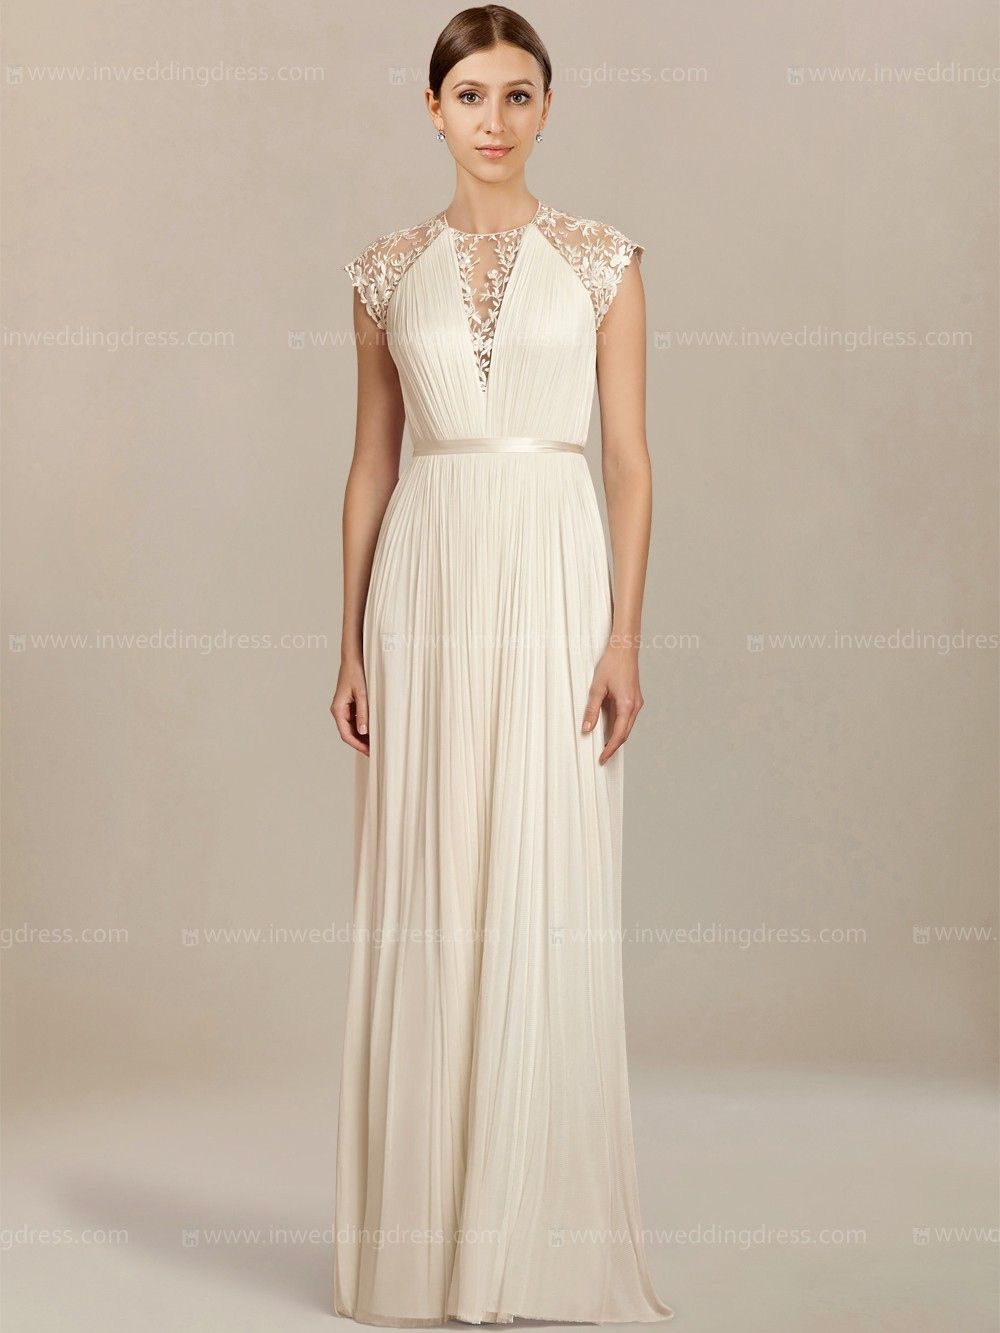 Simple Inexpensive Wedding Dresses - Best Shapewear for Wedding ...